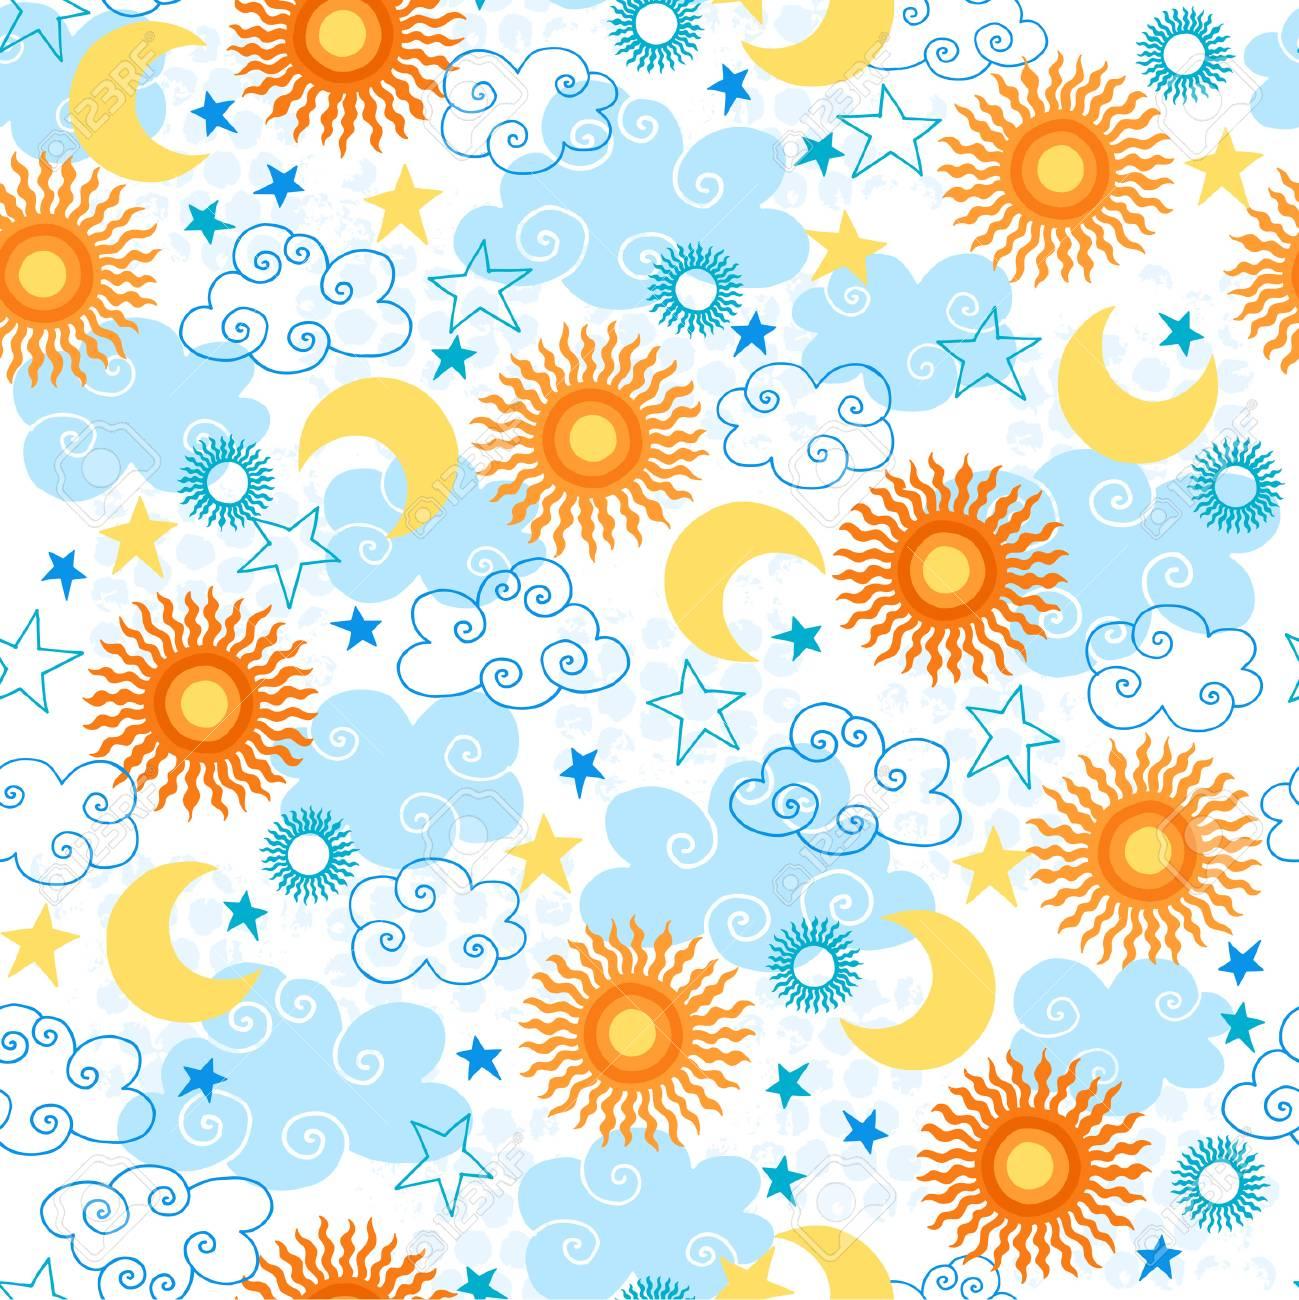 Seamless Repeat Pattern Vector Illustration Stock Vector - 3668439